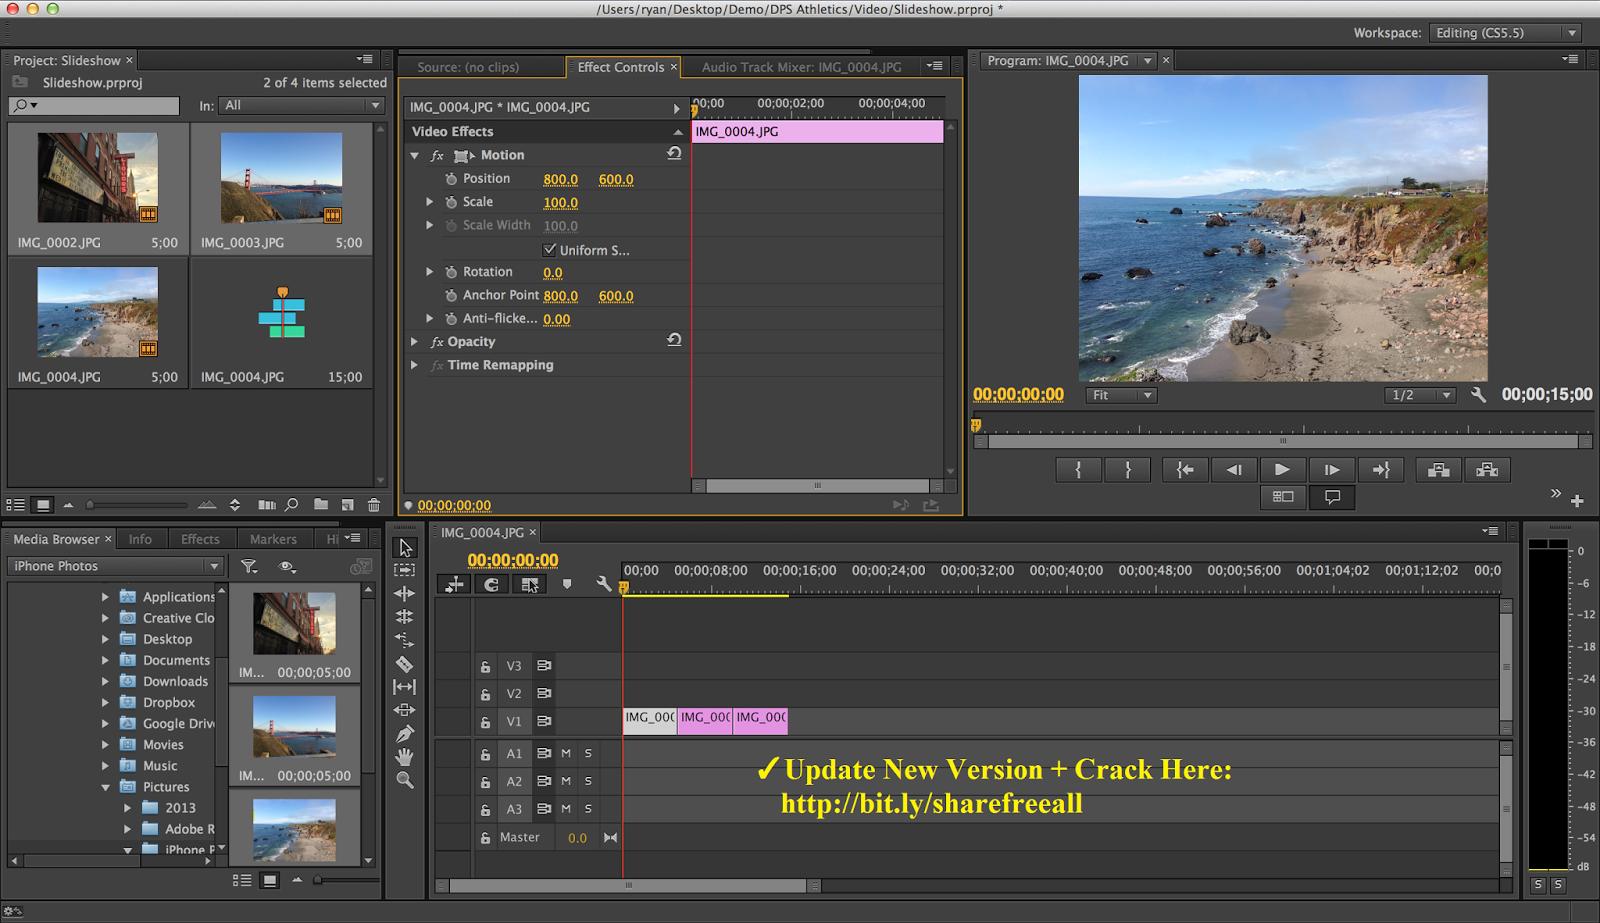 adobe premiere pro cc 2015 64 bit free download with crack